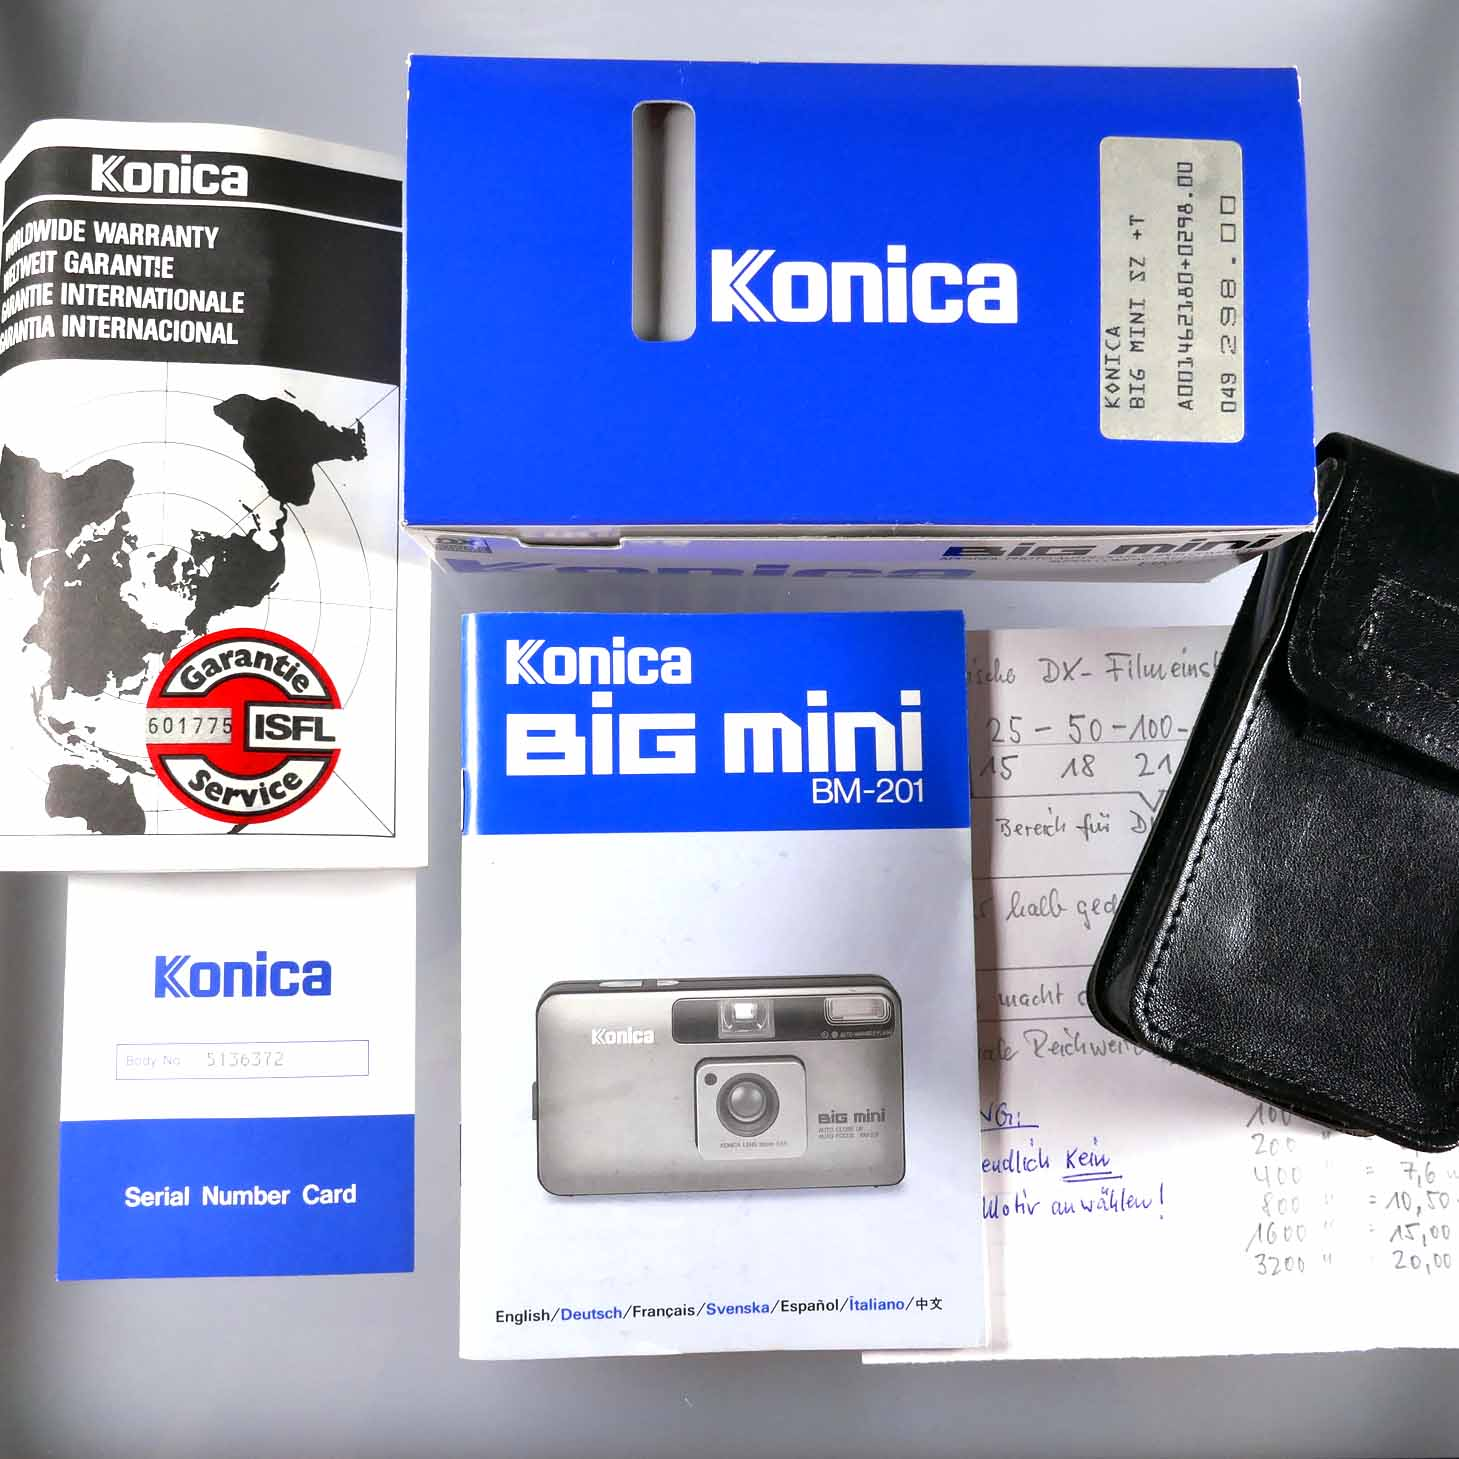 clean-cameras-Konica-Big.mini-07